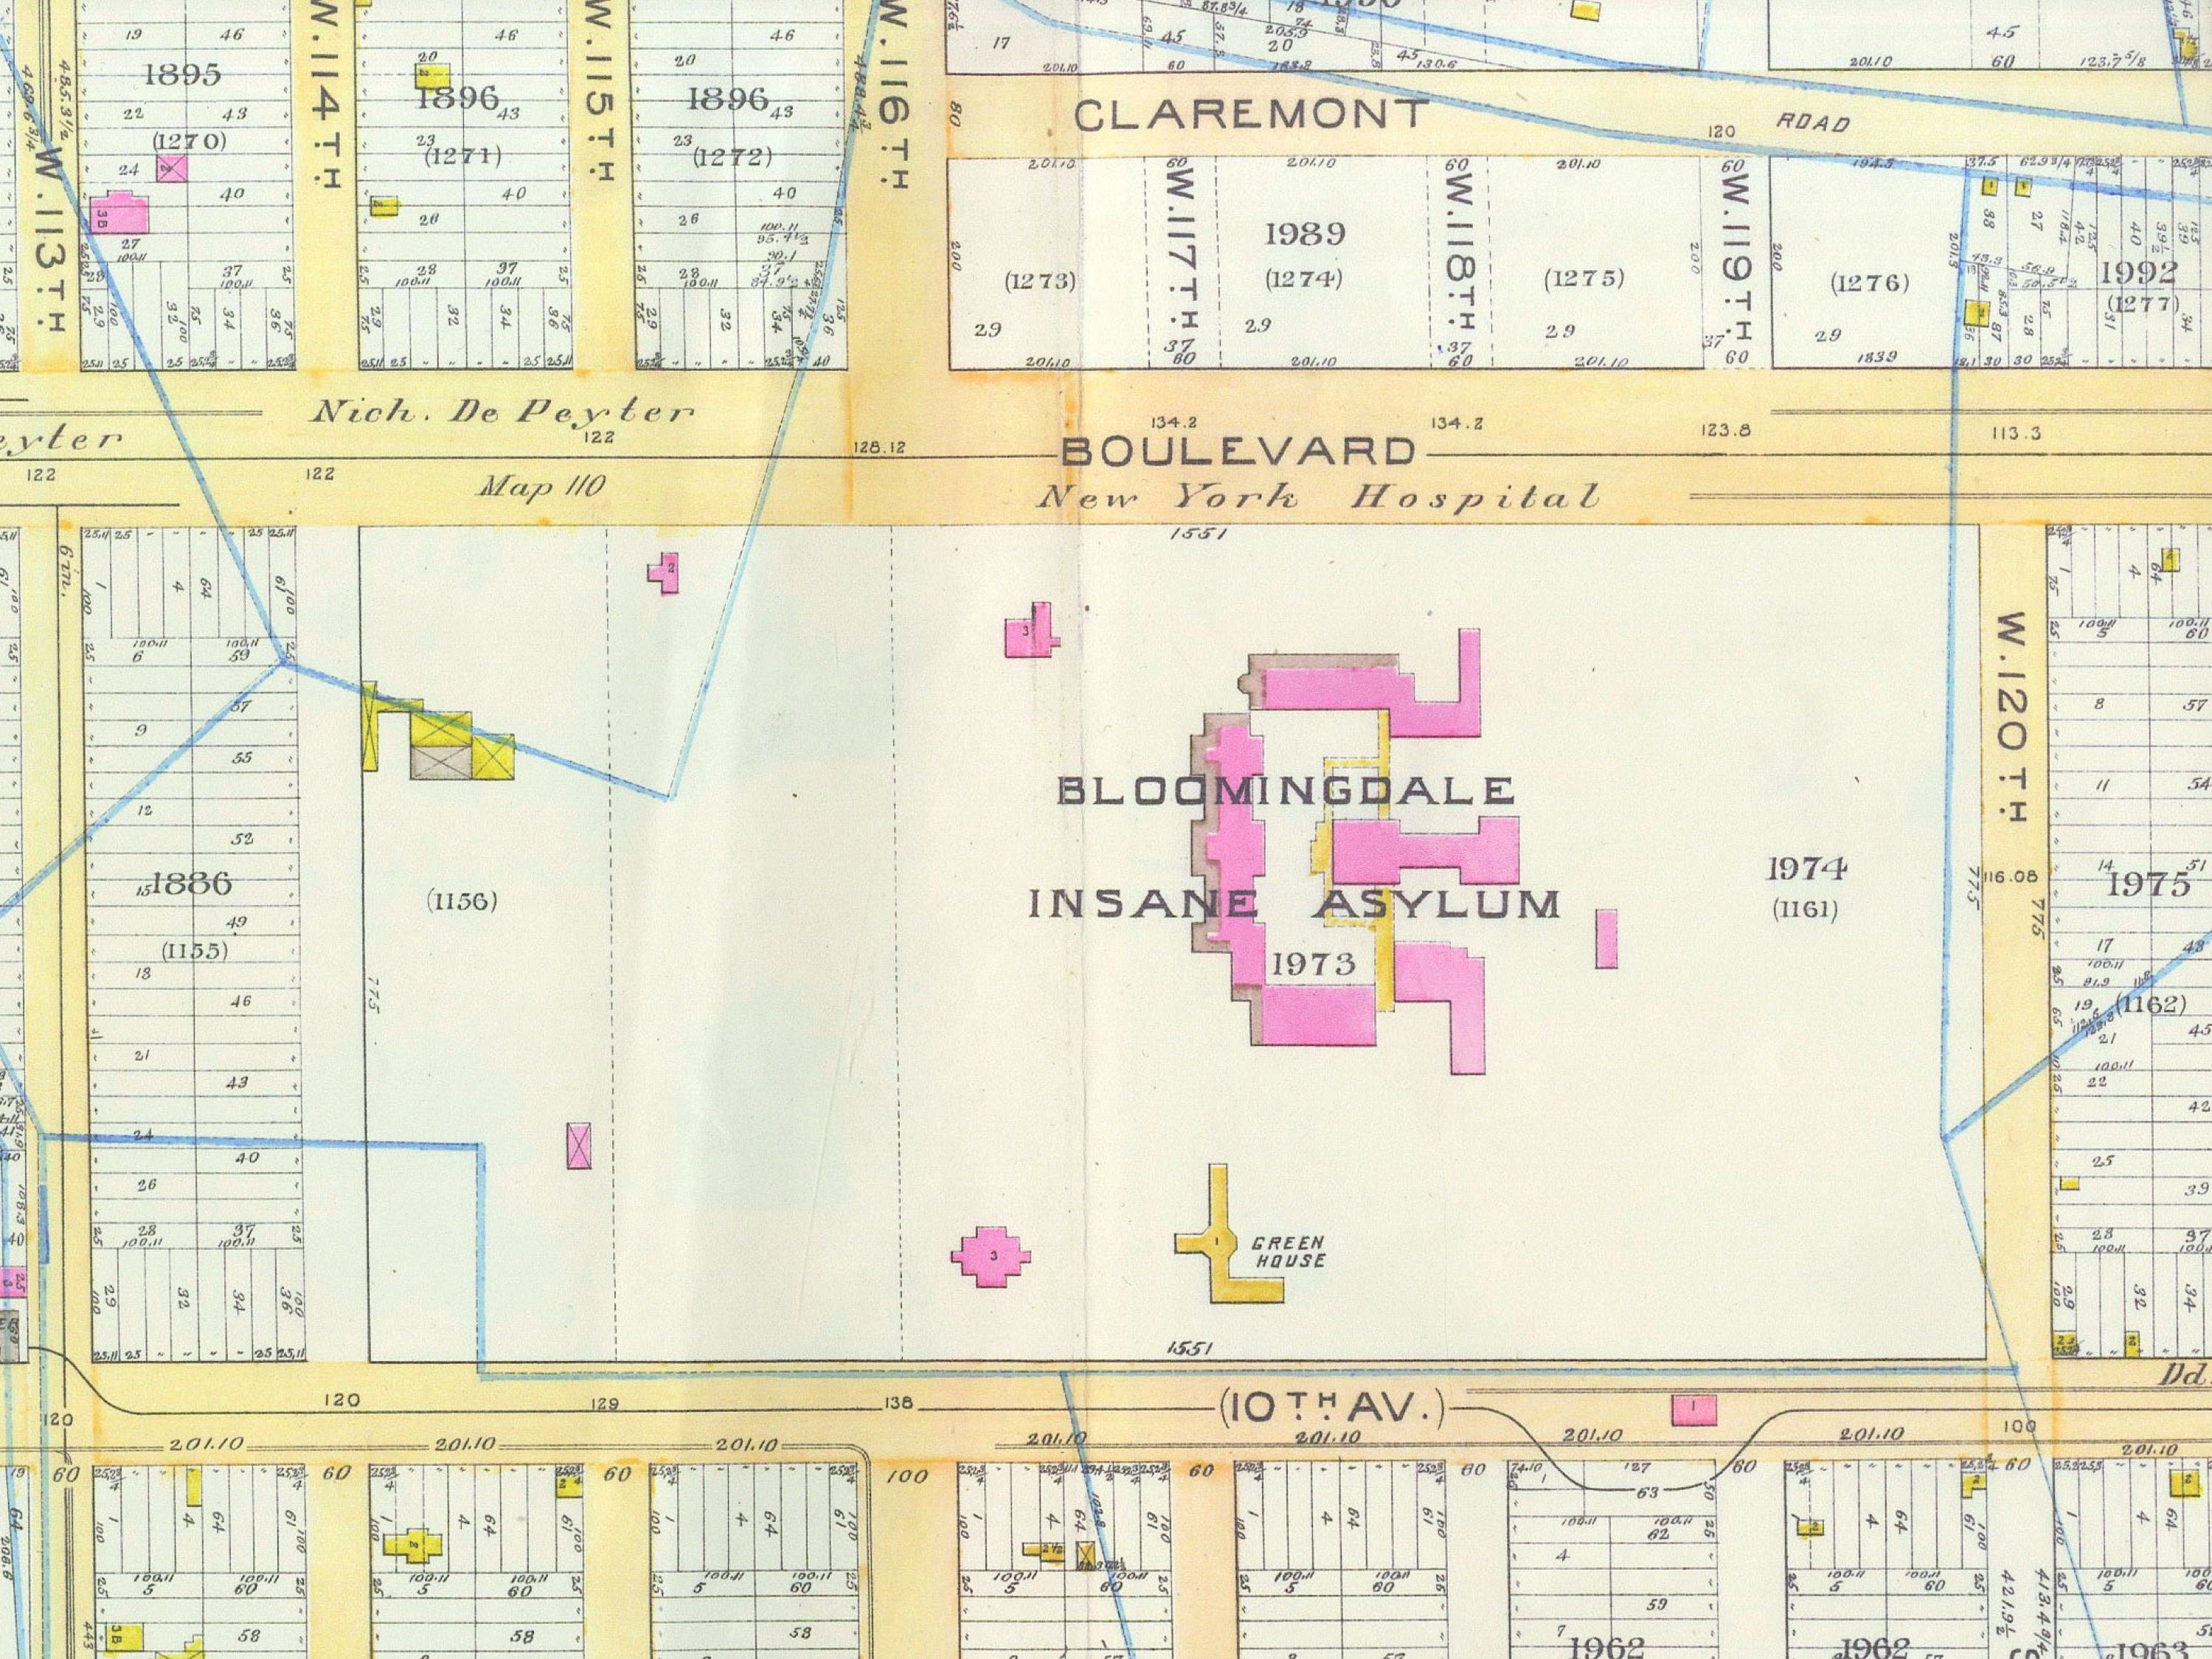 bloomingdale history History of the Bloomingdale area on